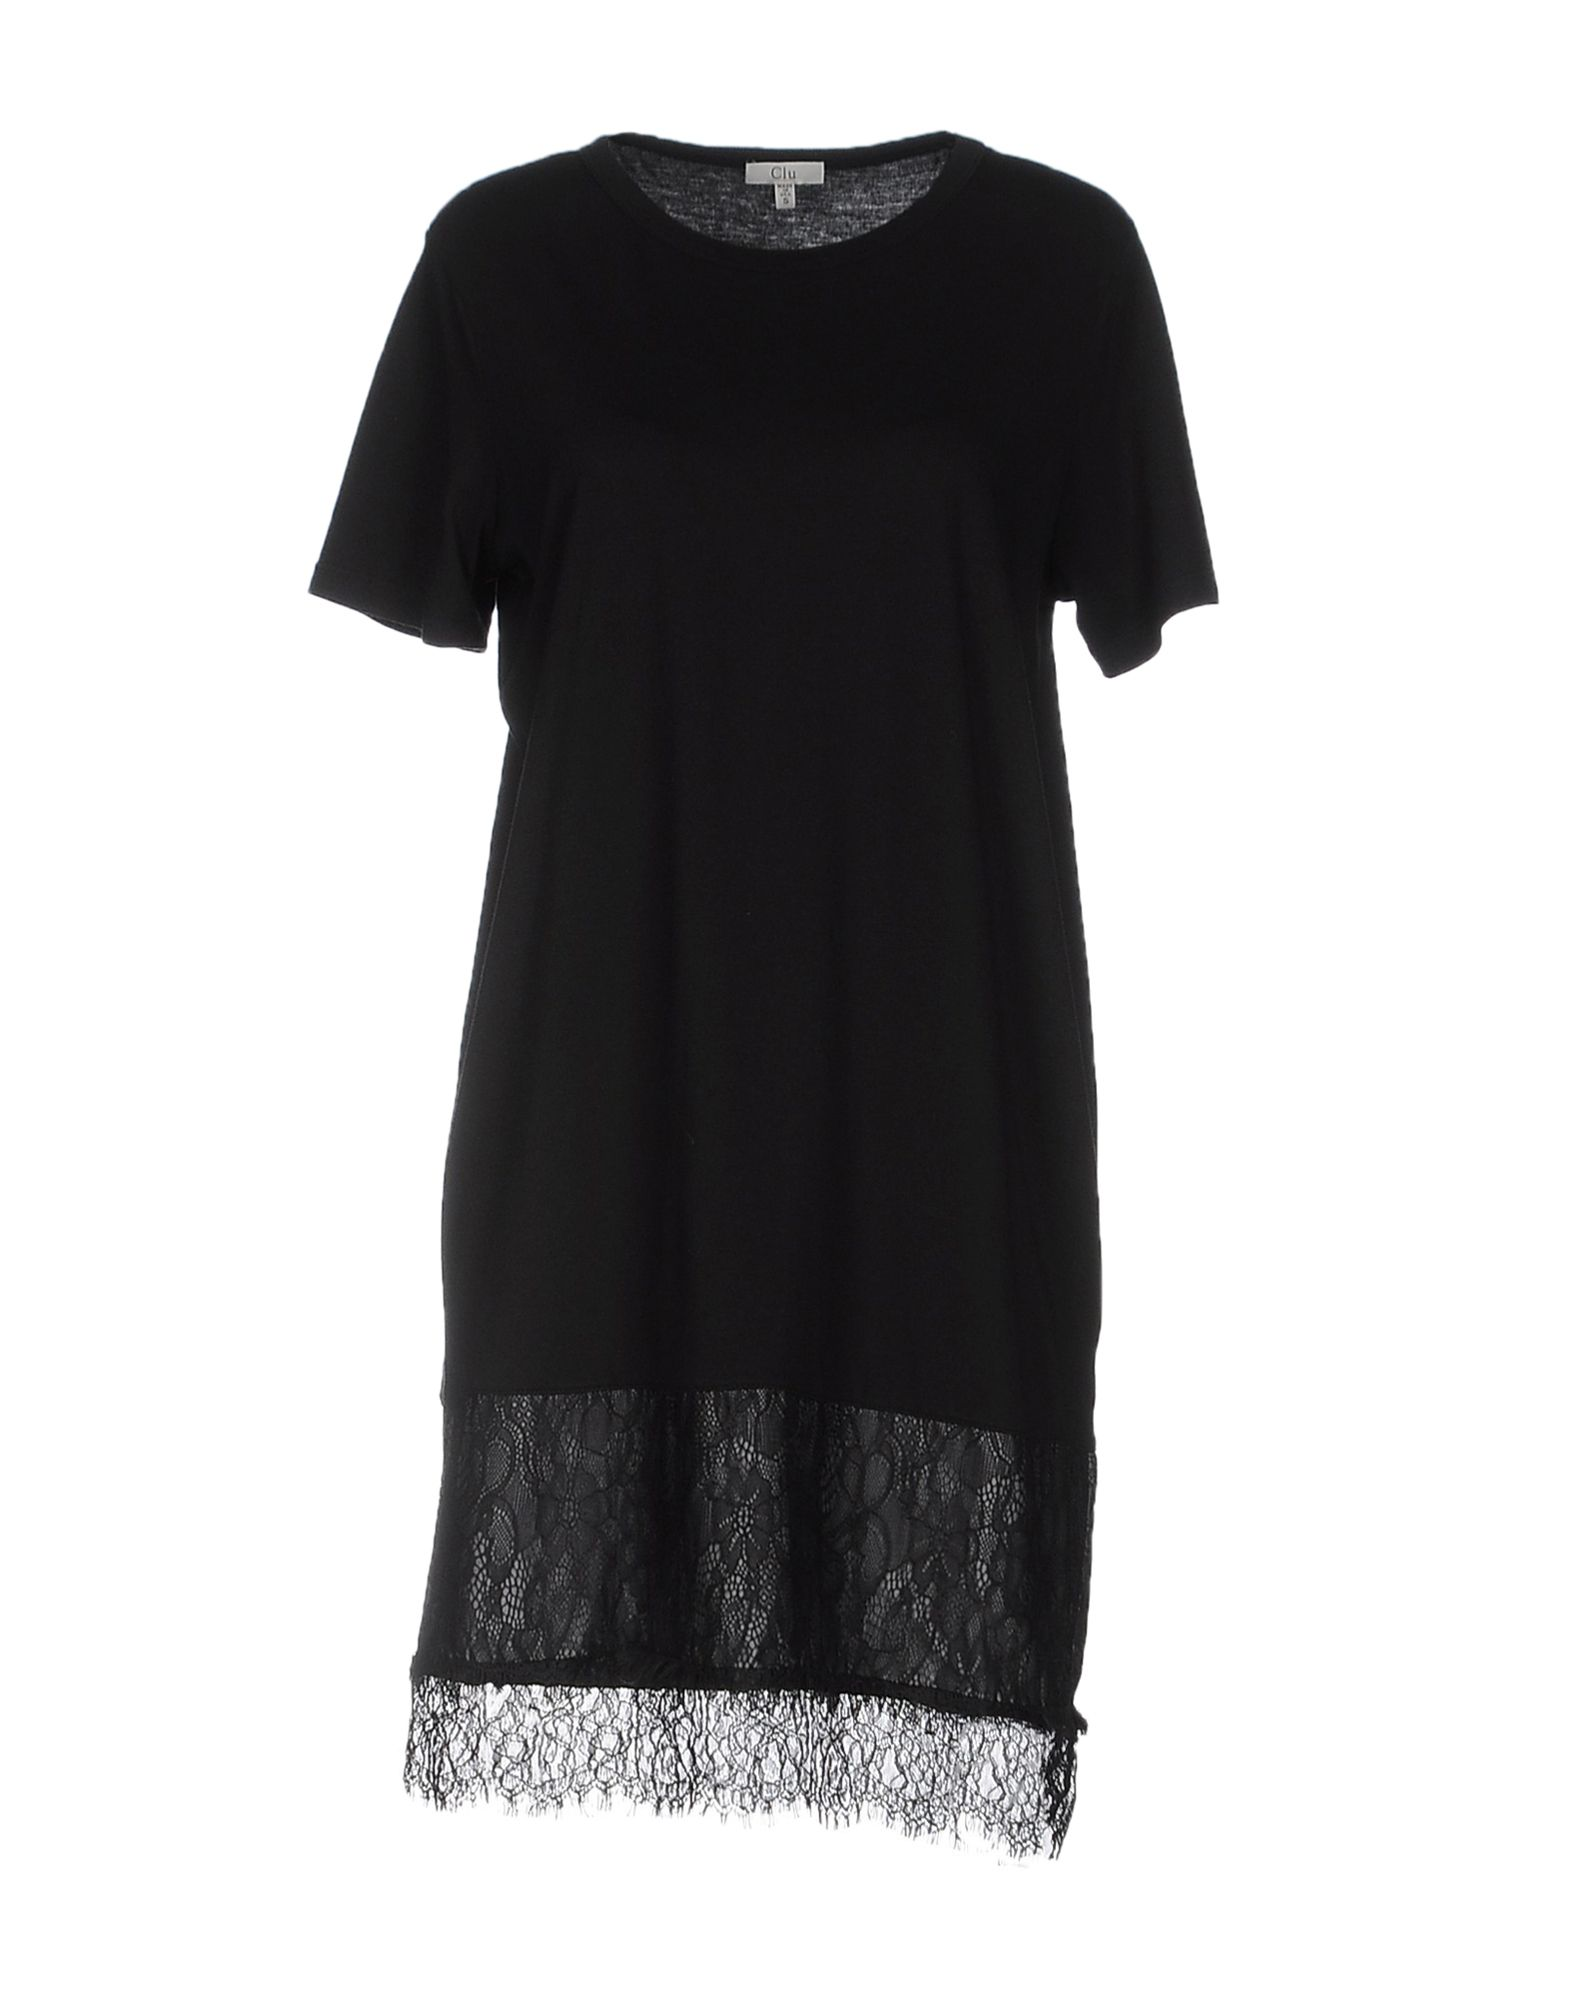 CLU Короткое платье юбка для девочки yb10545 разноцветный y clu